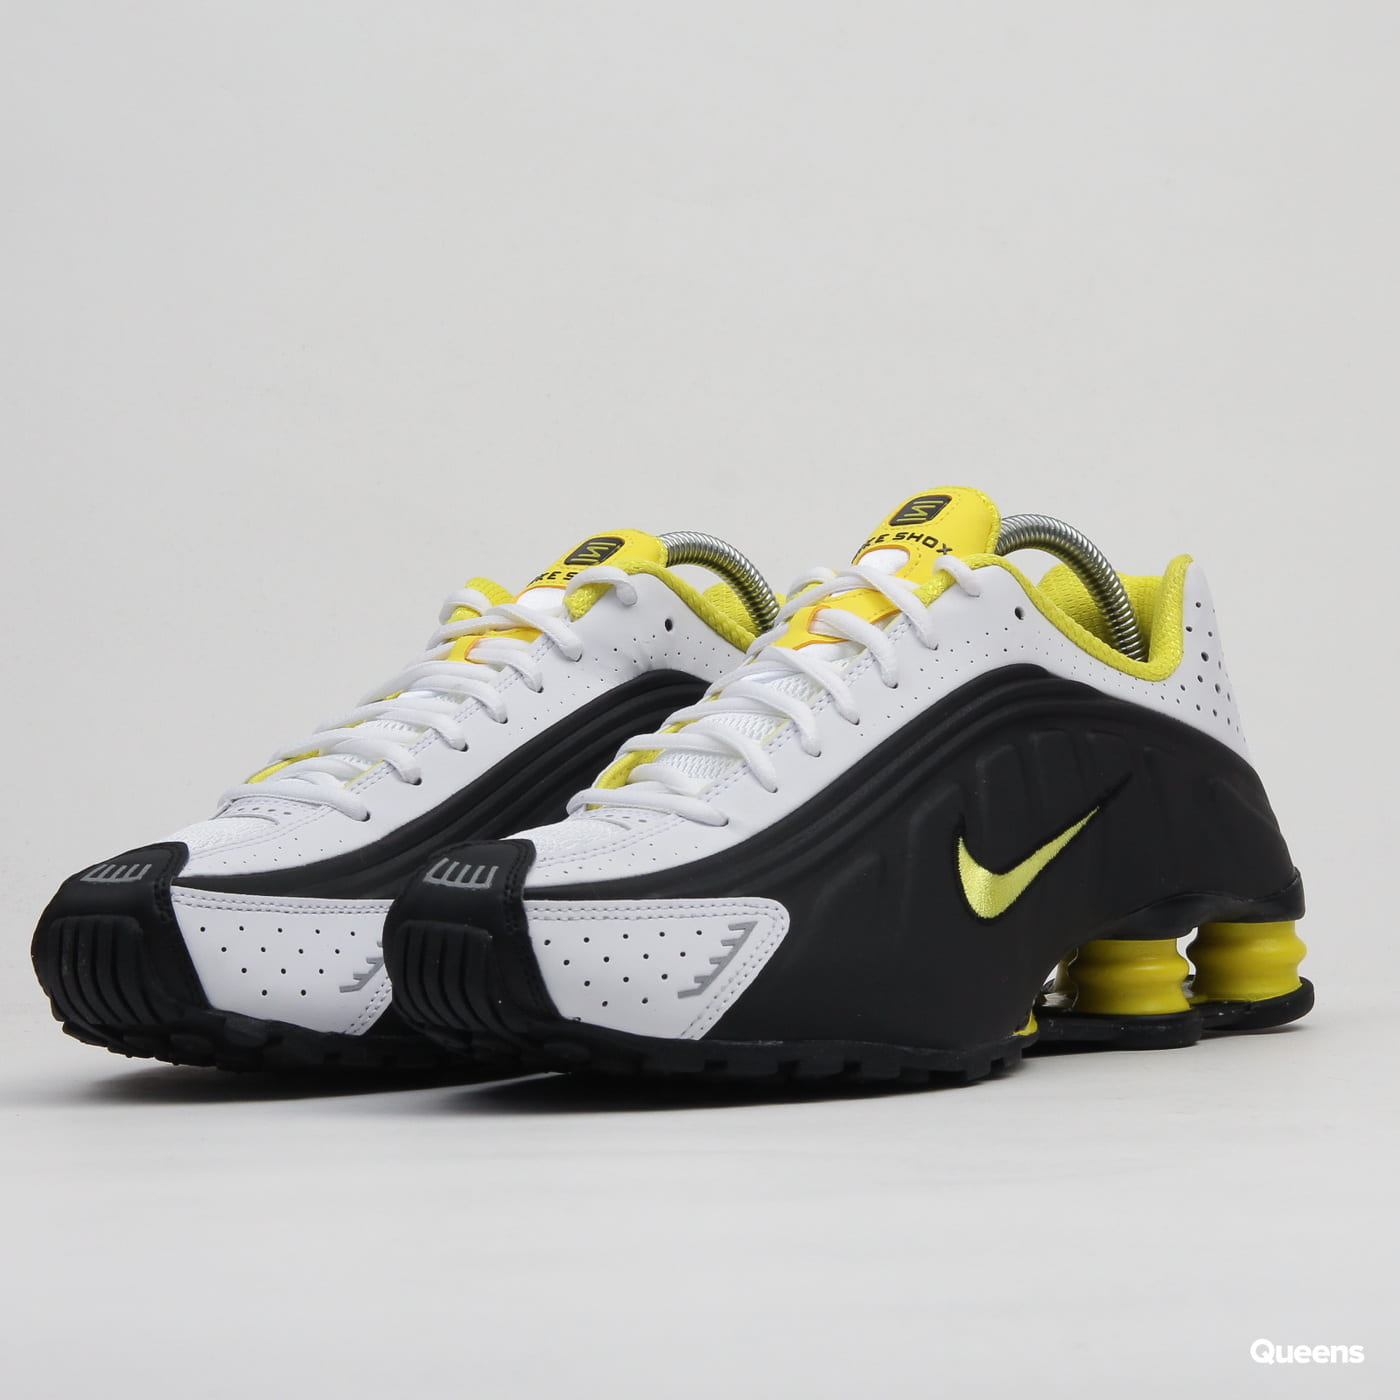 pretty nice 5f93f c0d68 Nike Shox R4 black / dynamic yellow - white